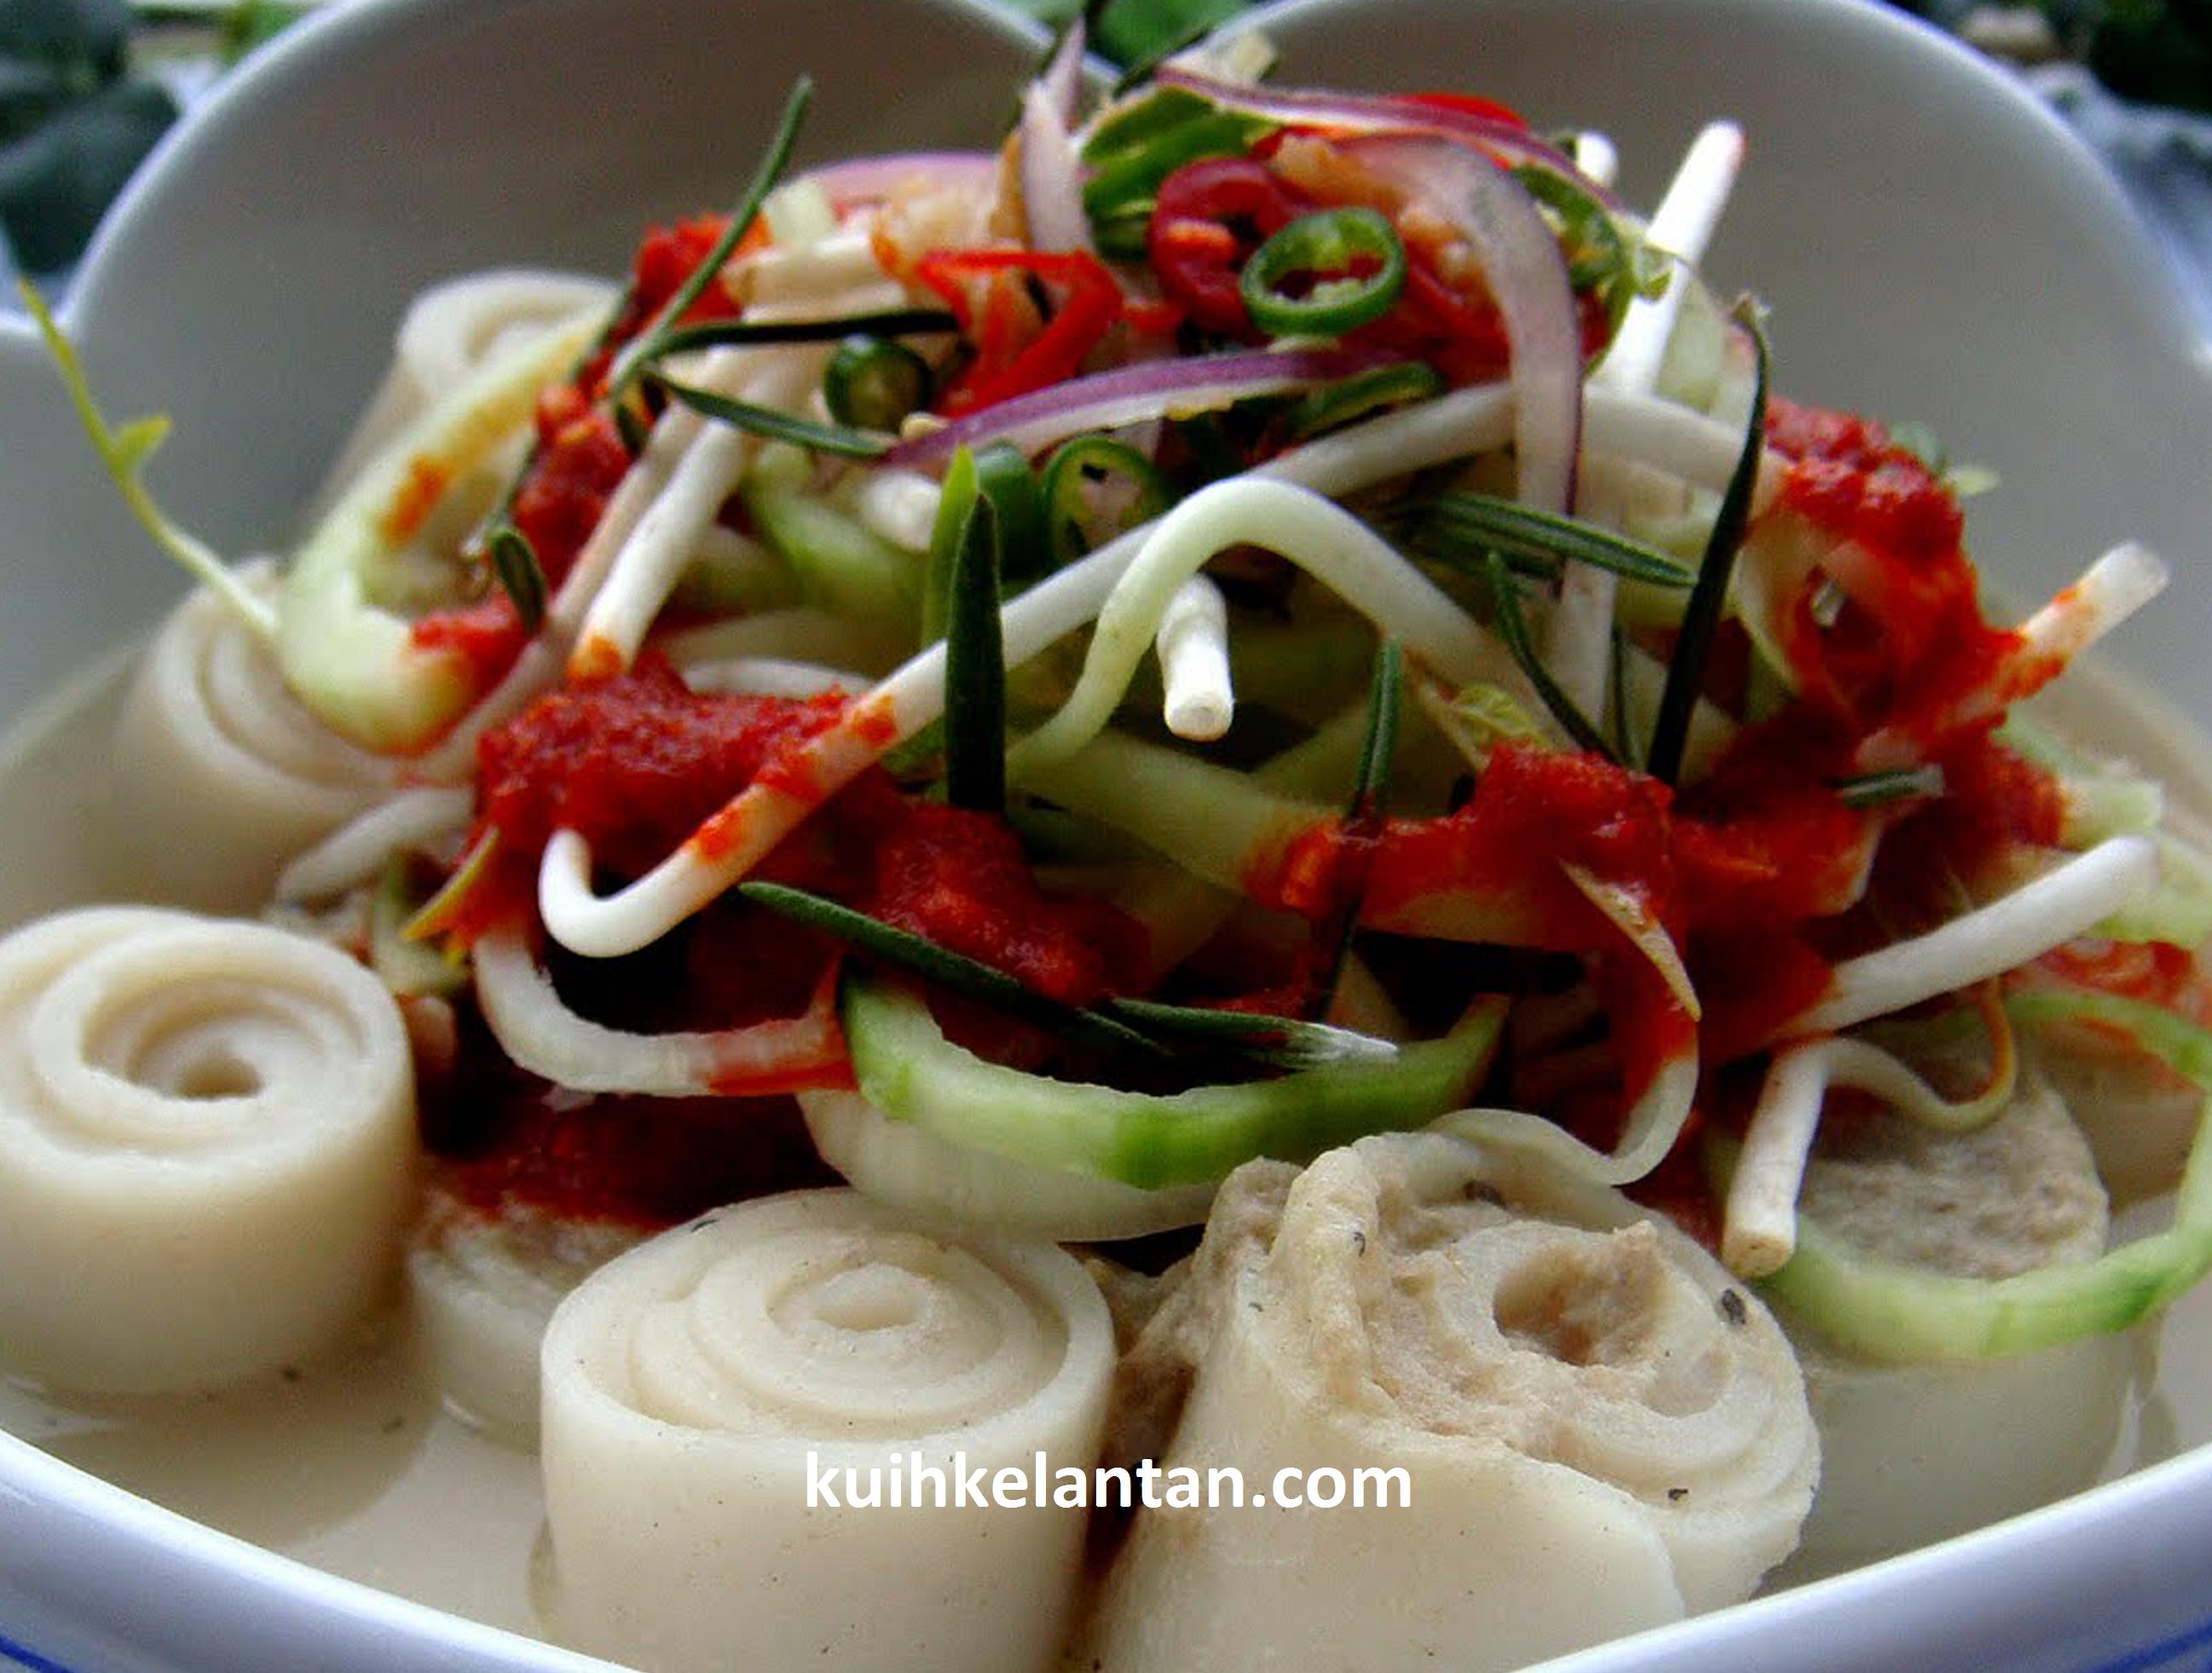 Image from Kuih Kelantan